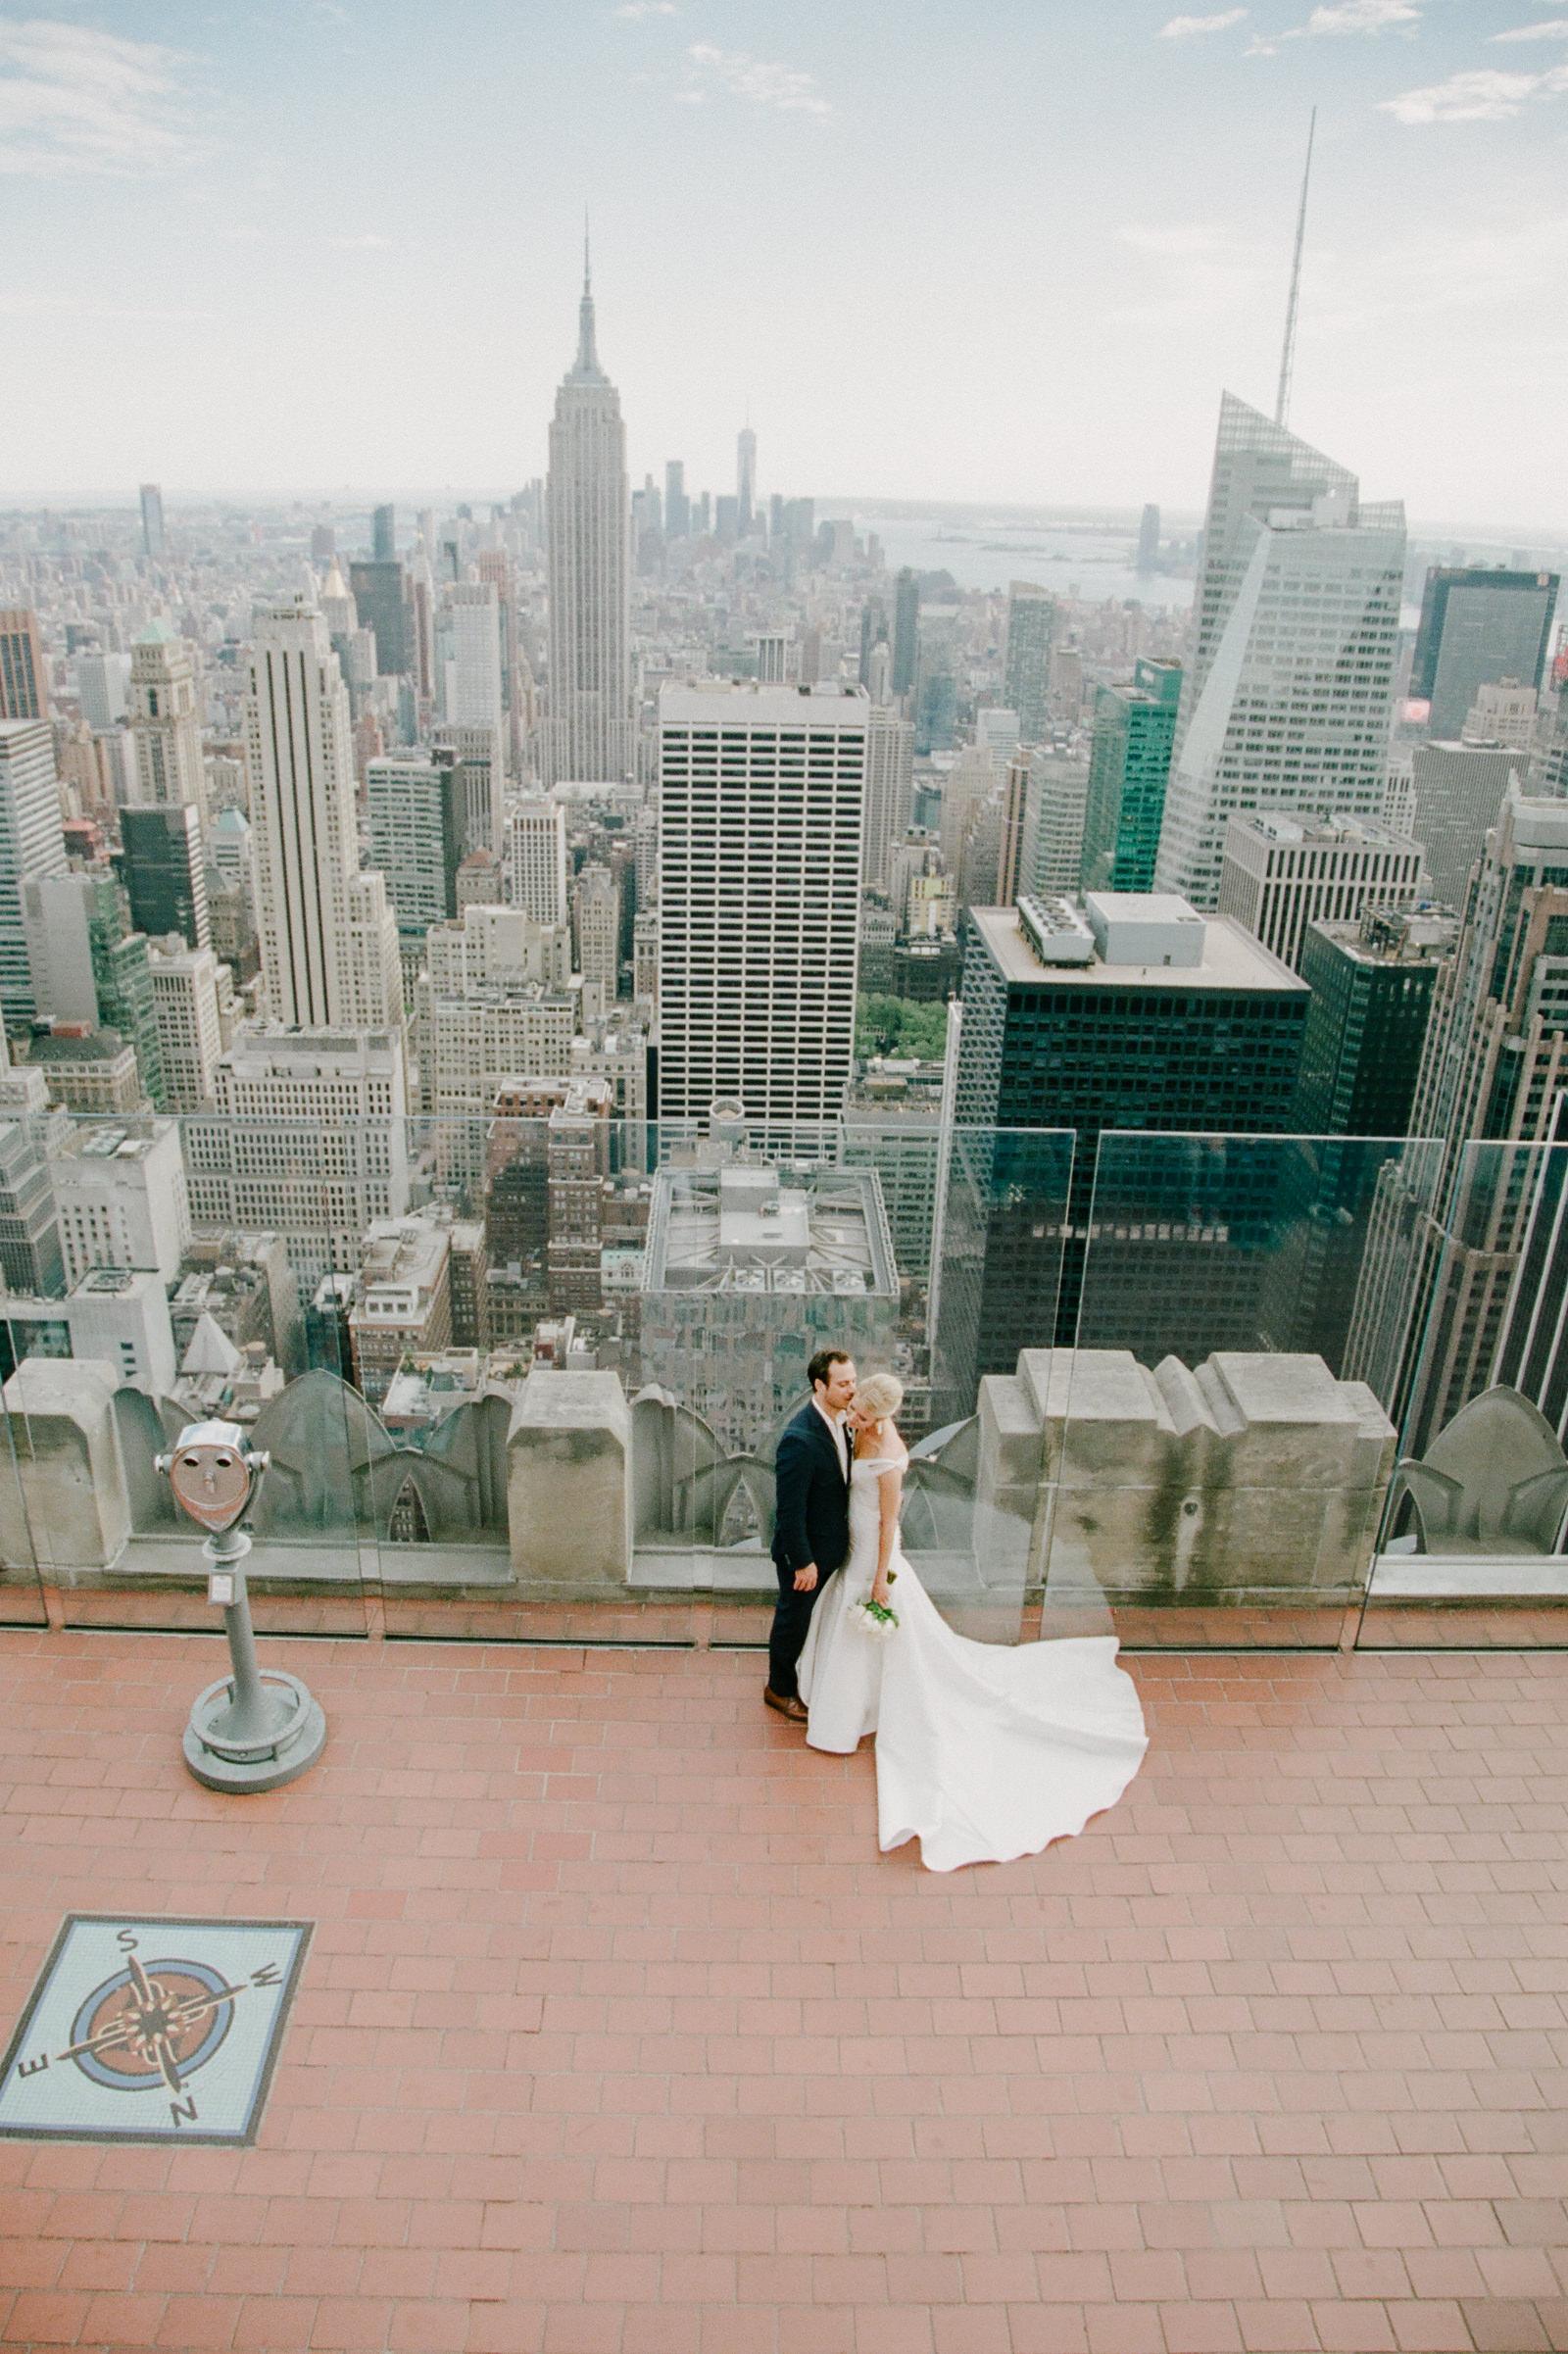 Intimate-NYC_wedding_ by Tanya Isaeva-169.jpg